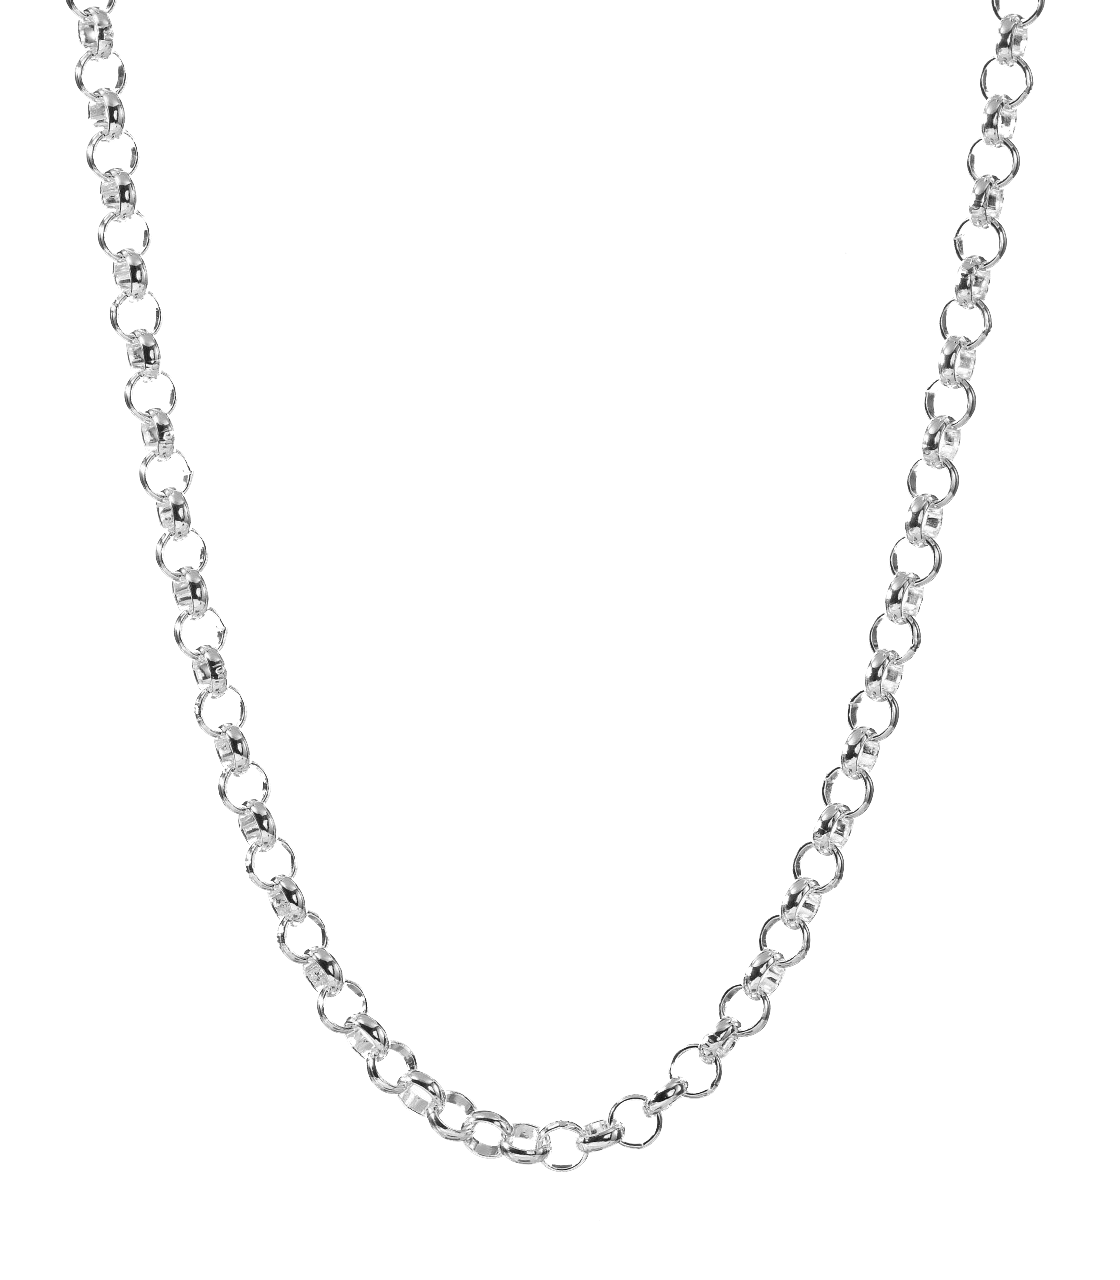 Money Necklace Roblox